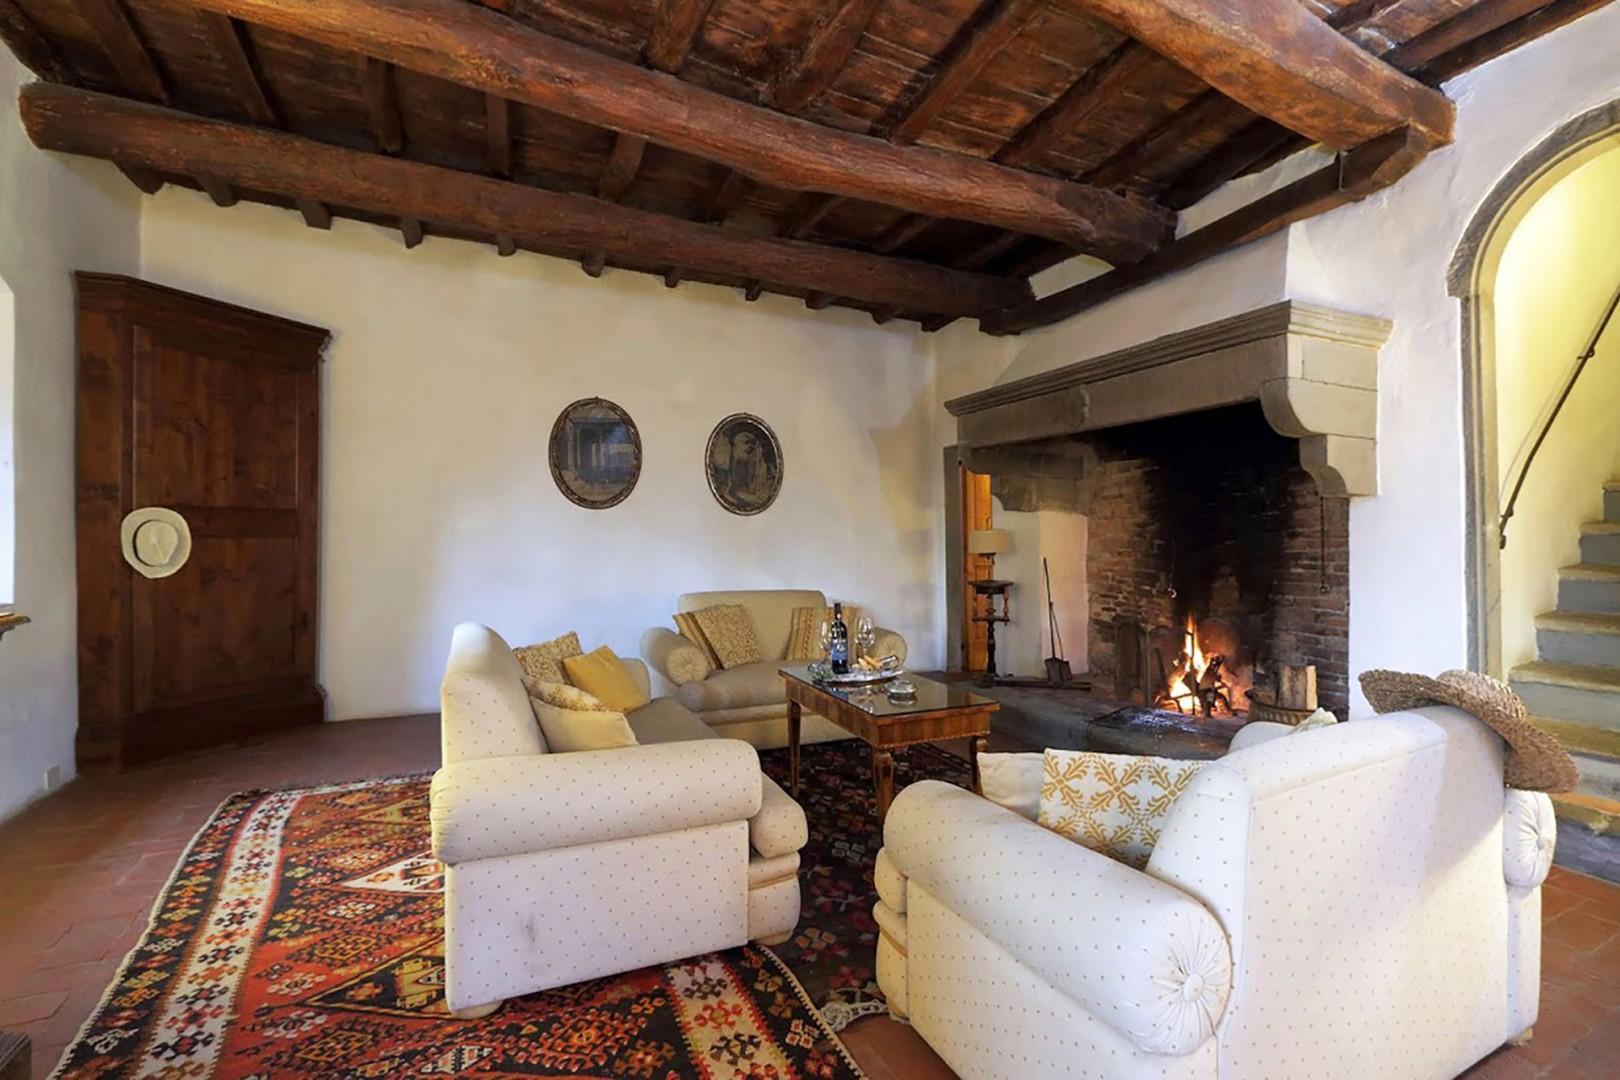 Beautiful antique Kilim carpets grace the floors throughout.